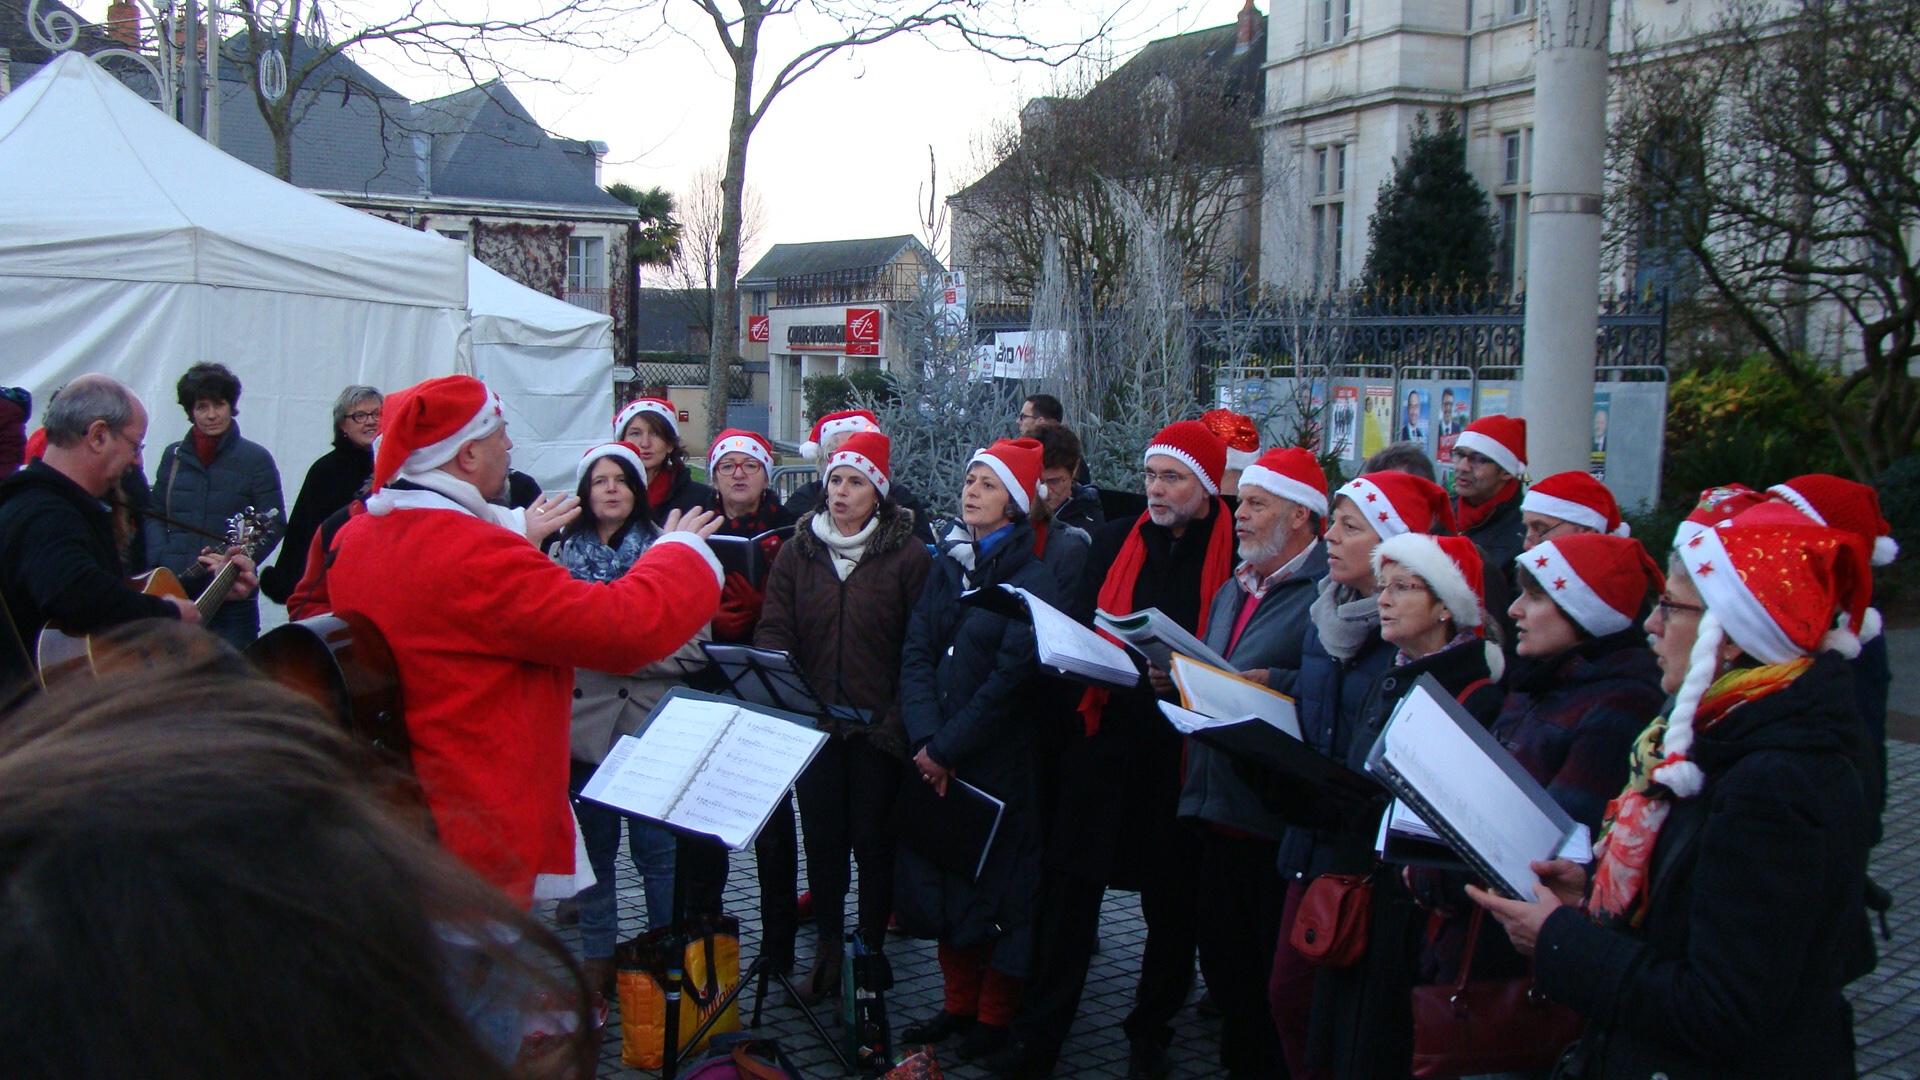 2015-12-12 – Au marché de Noël (14) Anita